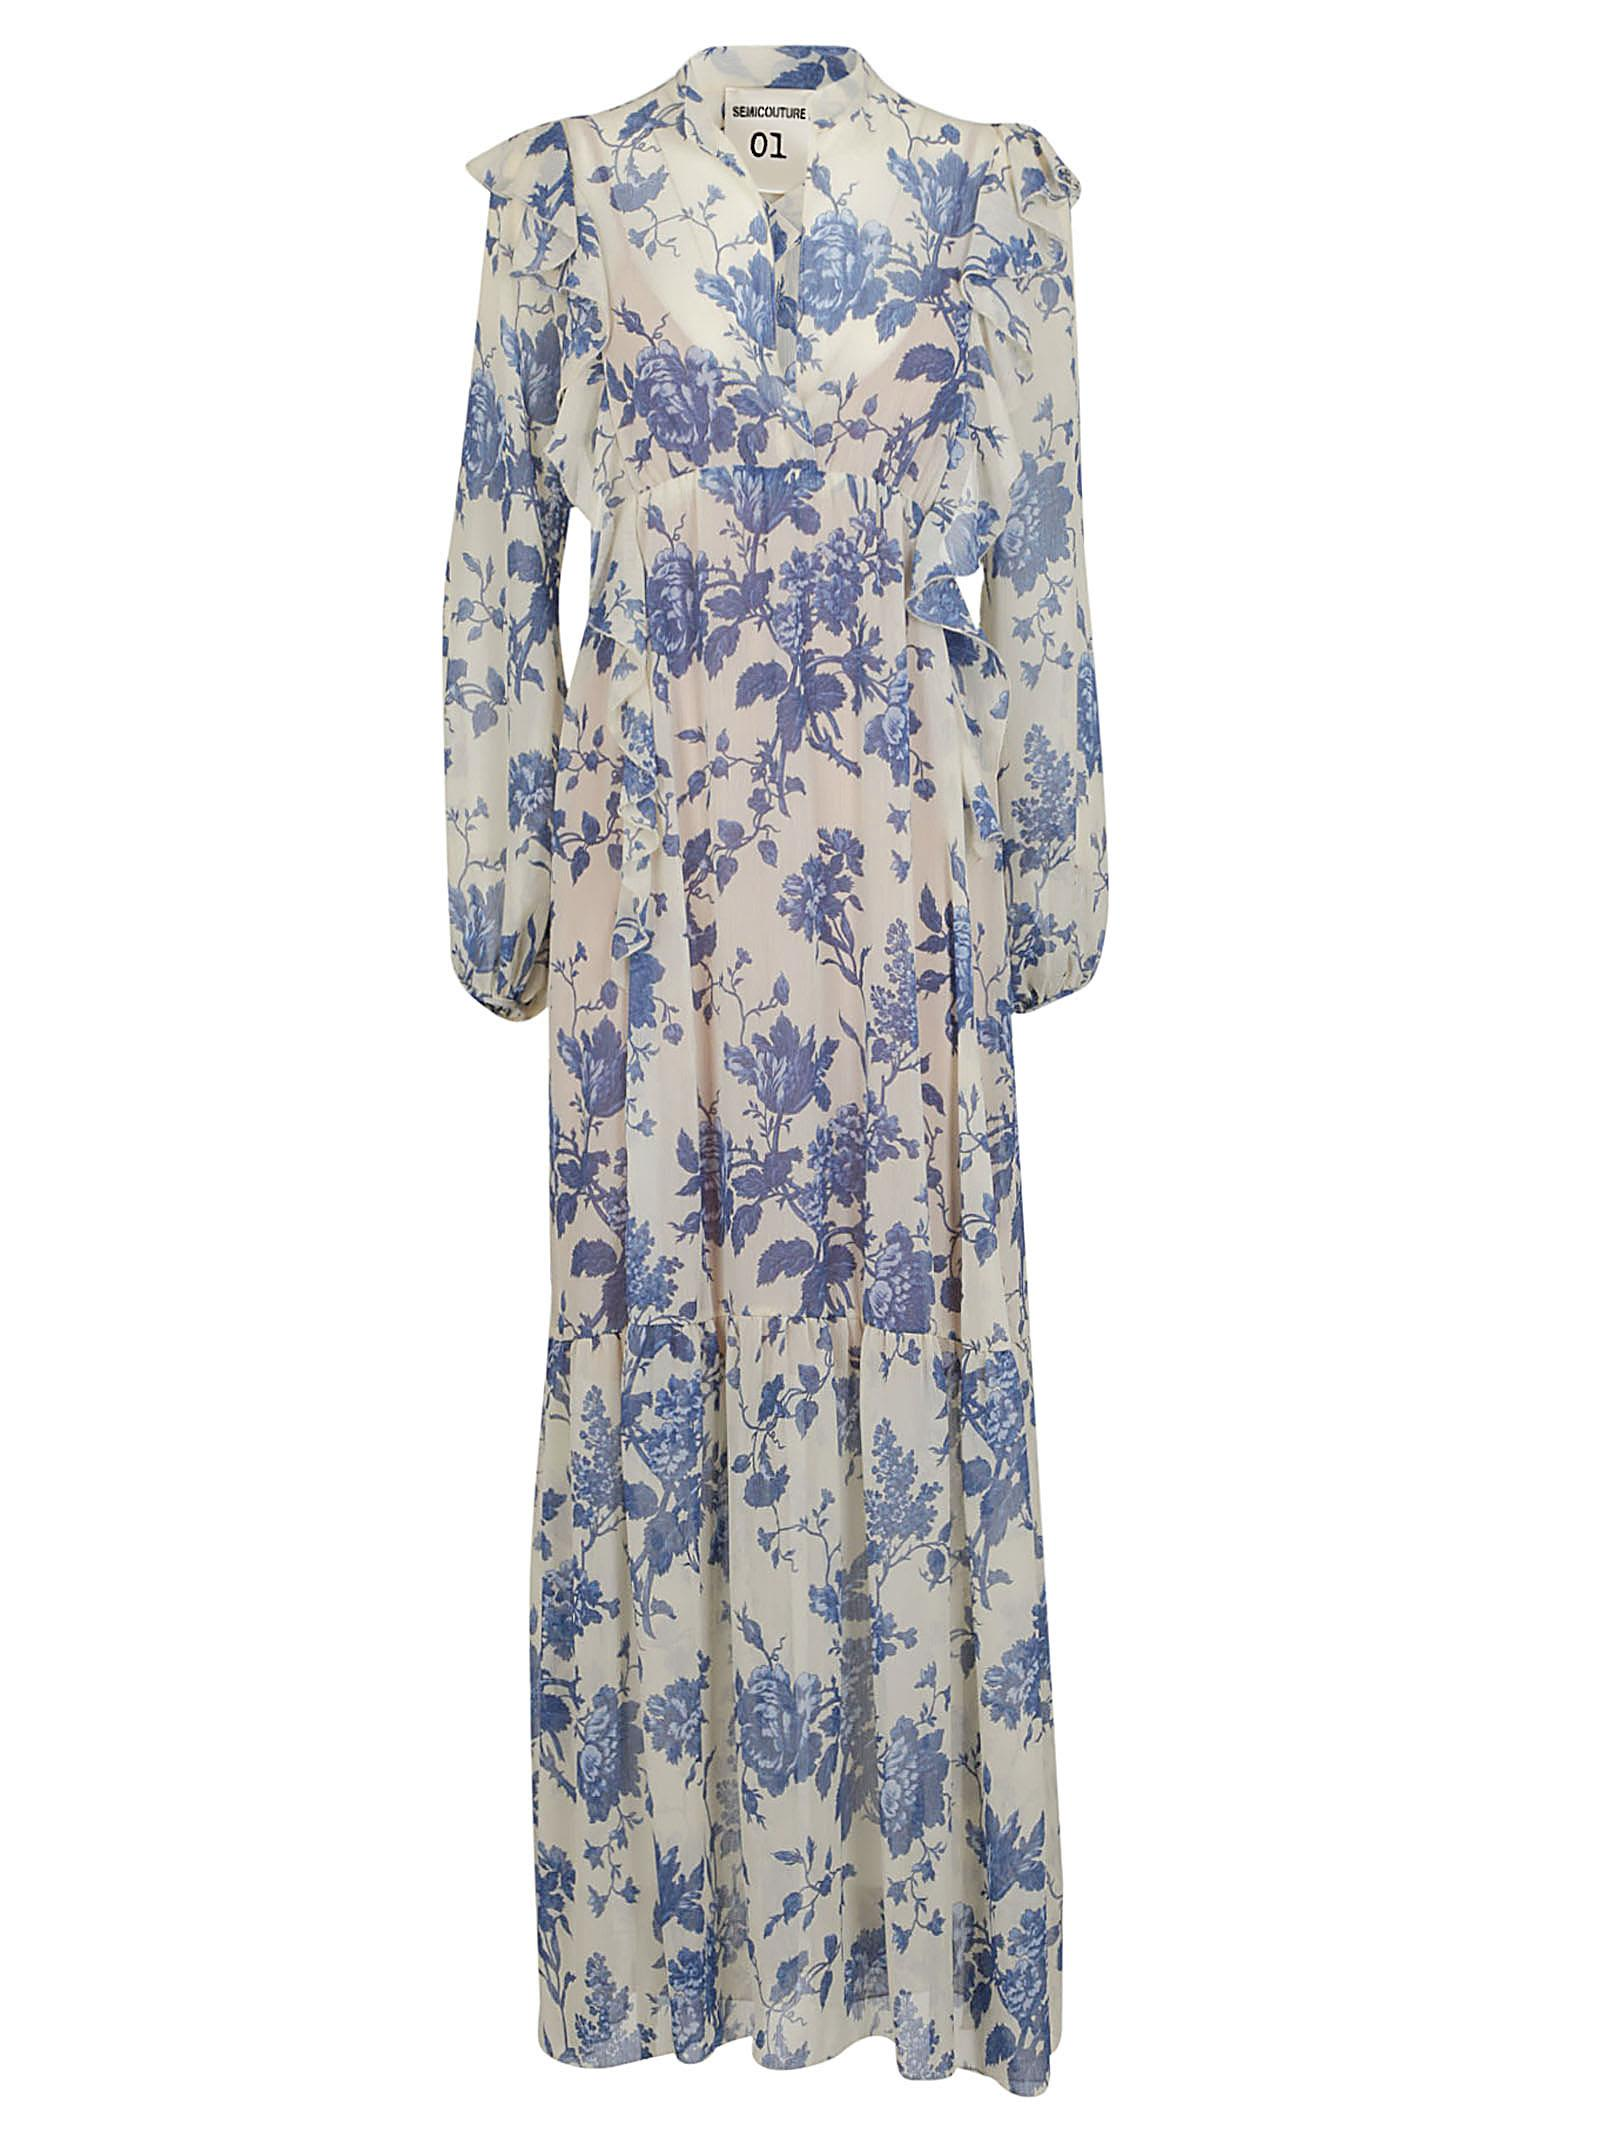 Semicouture Floral Print Dress